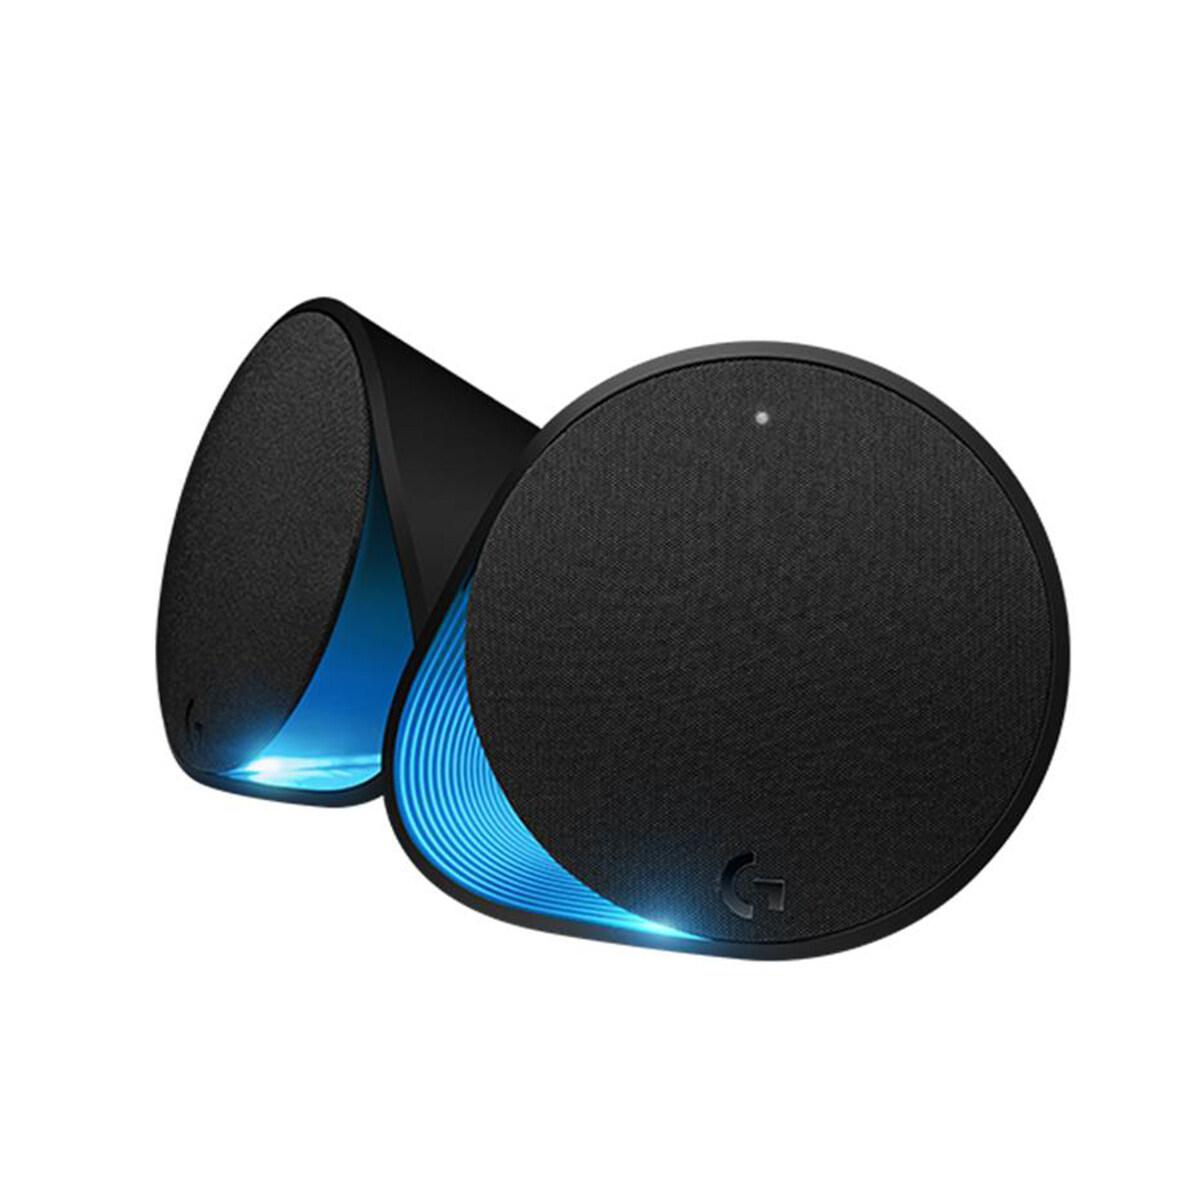 Logitech Gaming Speaker G560 with Lightsync RGB, 7.1 DTS:X Ultra Surround Sound, Audio Visualizer, 240 Watts Powerful Sound, Logitech G-Hub Support, Bluetooth 4.1, 3.5MM Audio Jack (980-001304)